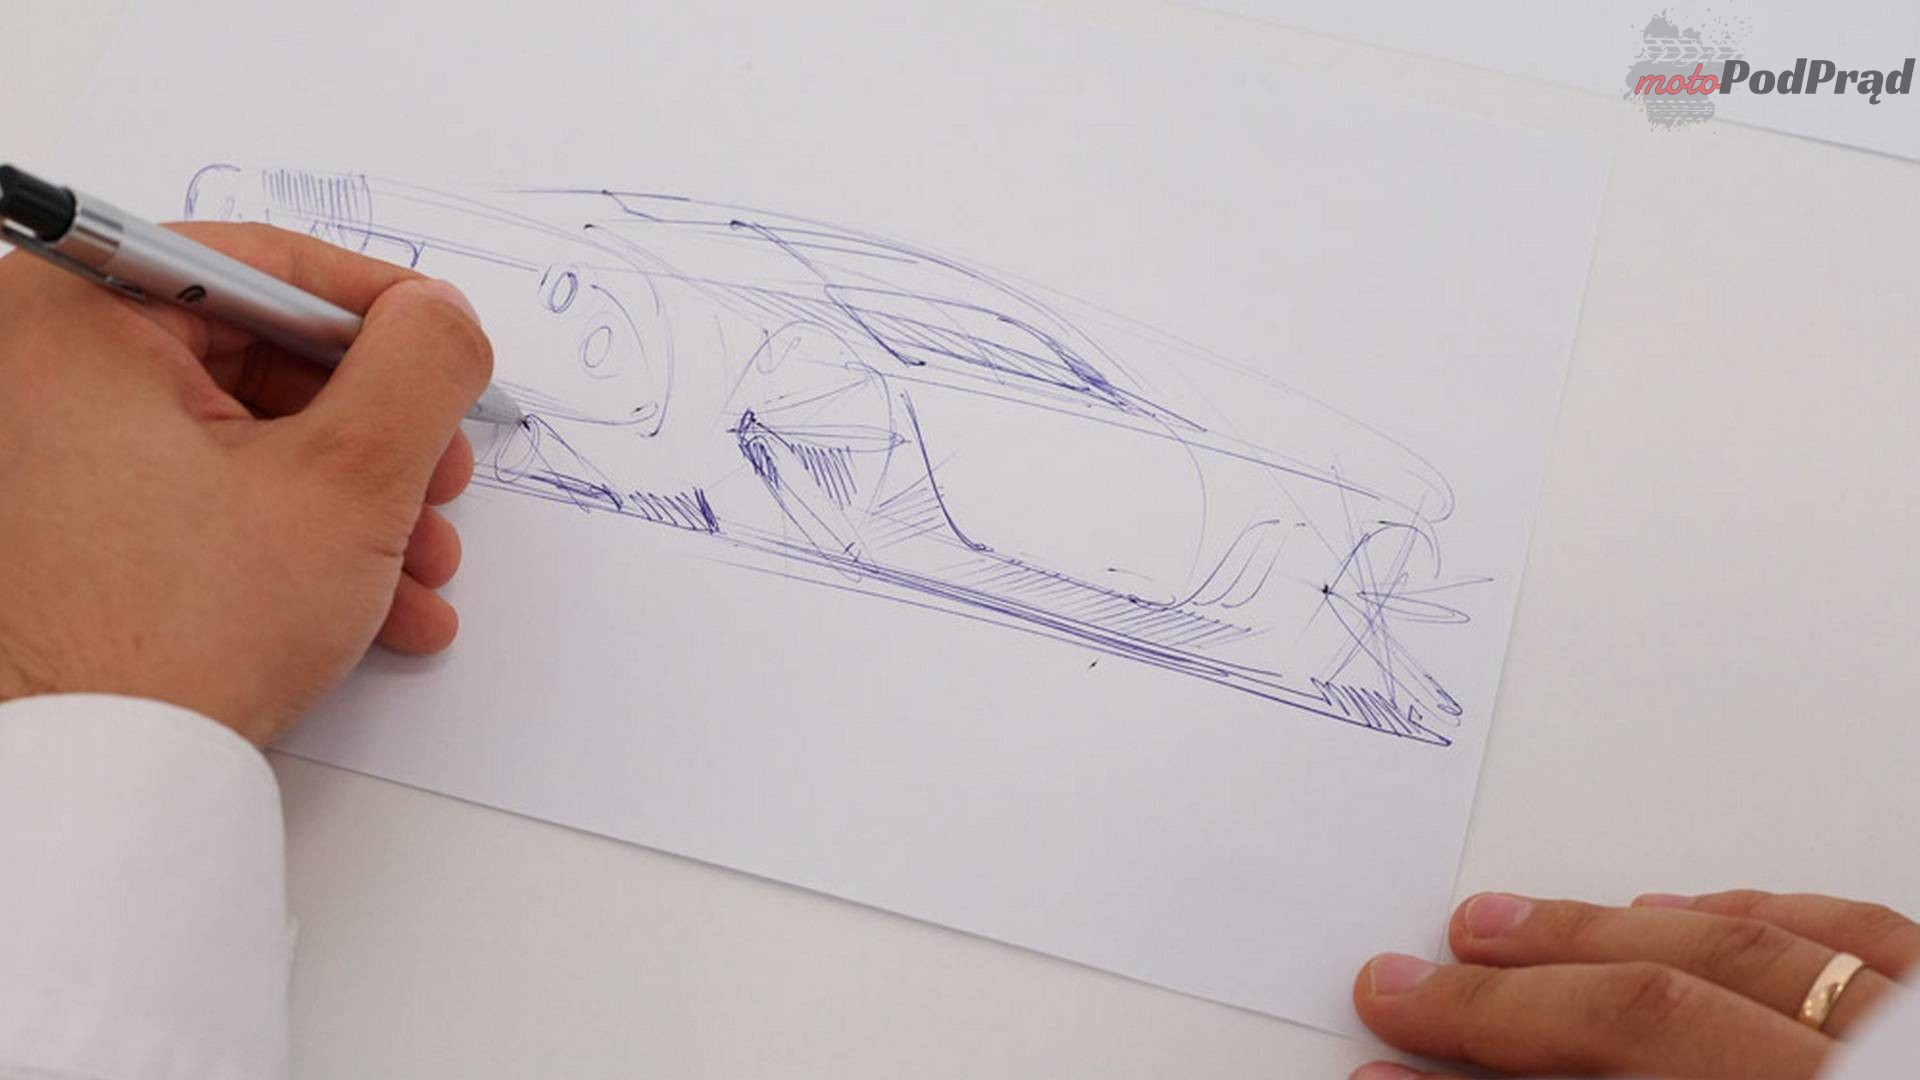 ferrari 812 superfast based 250 gto by ares design 3 Reiknarnacja GTO, której Ferrari nie stworzyło